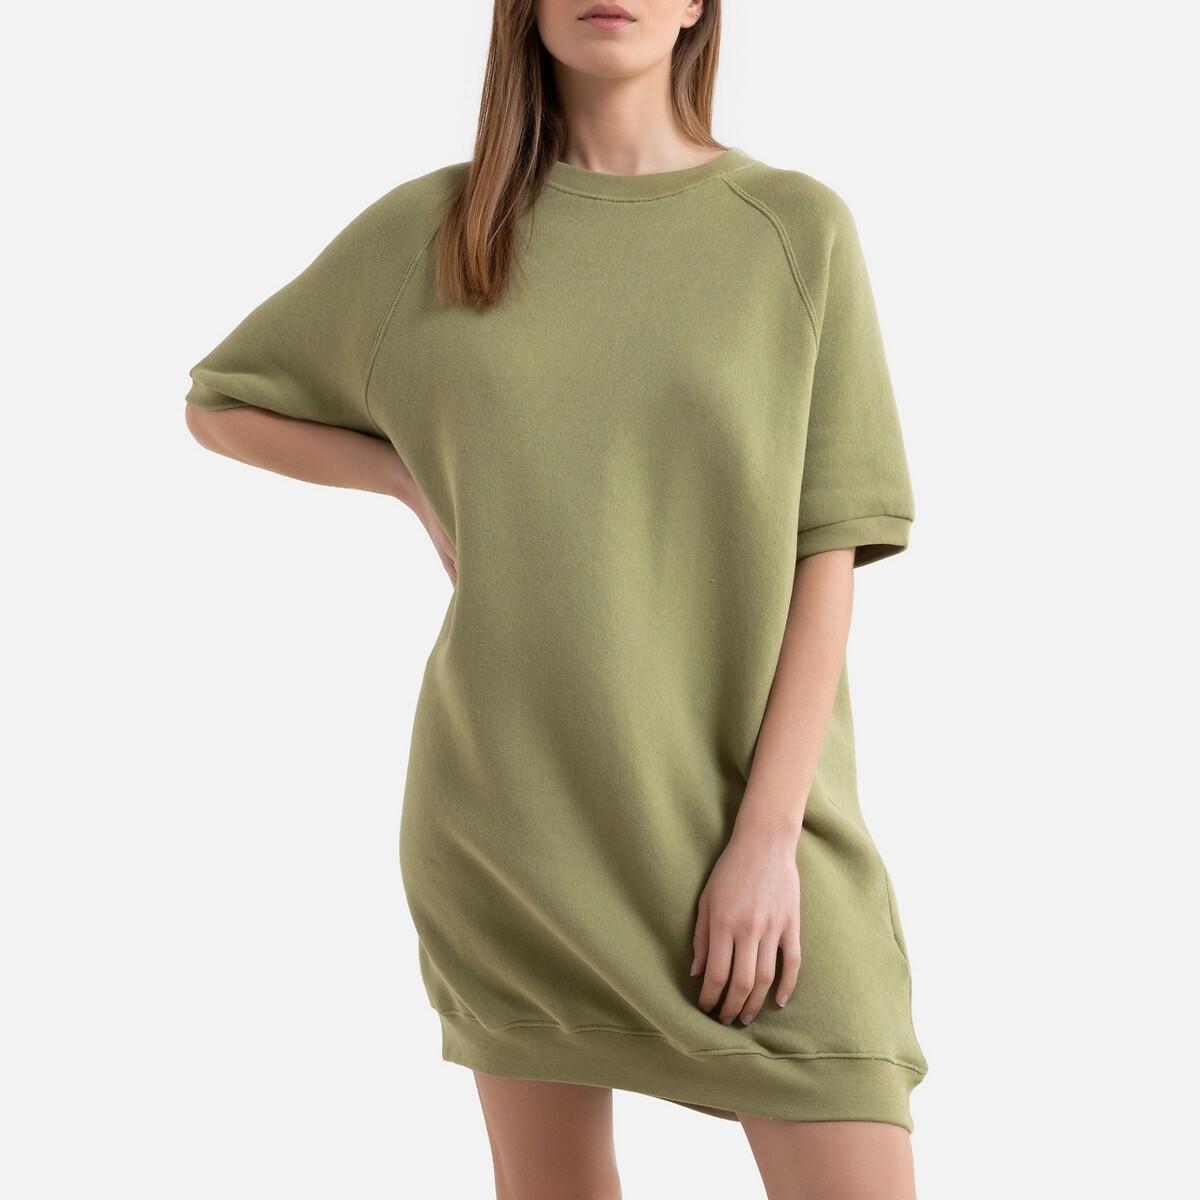 Платье-свитшот LaRedoute Укороченное с короткими рукавами IKATOWN M/L зеленый футболка laredoute из биохлопка с короткими рукавами vegiflower m зеленый